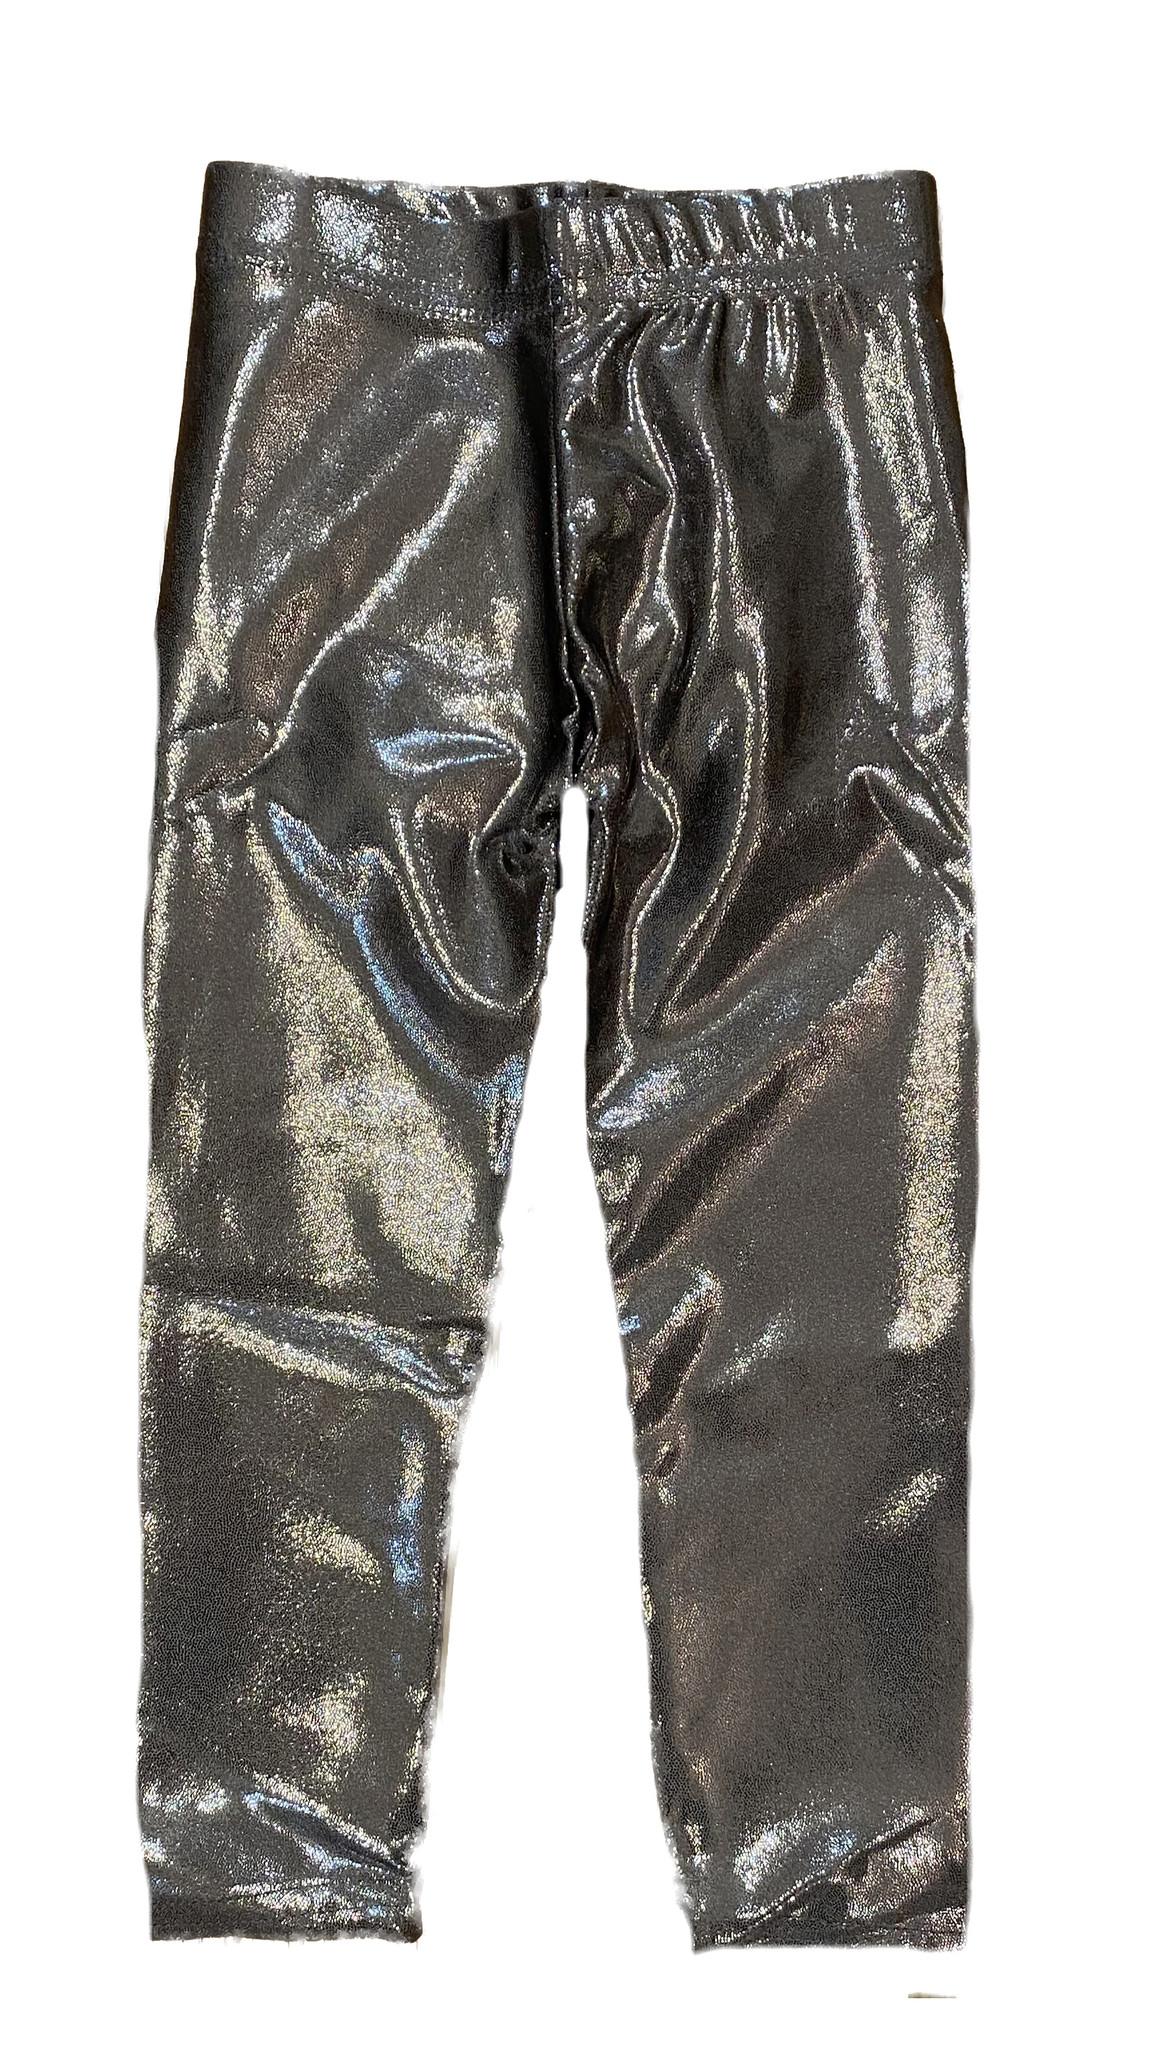 Dori Charcoal Lame Infant Leggings